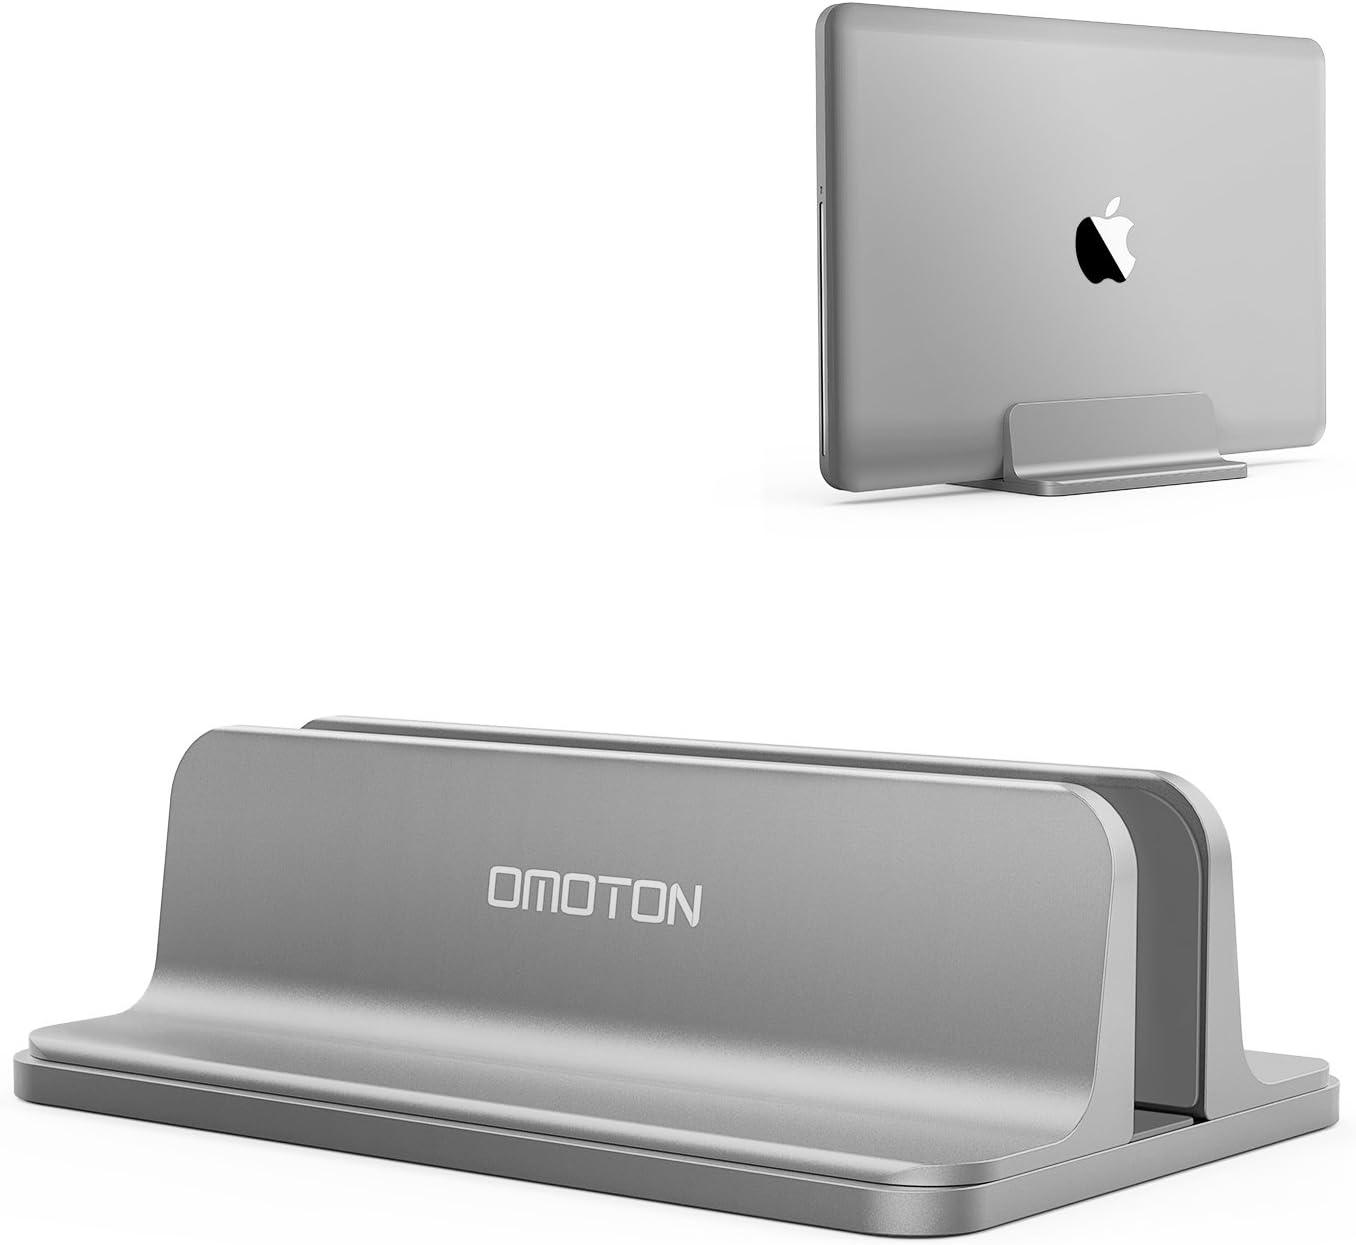 Soporte ajustable laptops hasta 17.3 pulgadas omoton gris